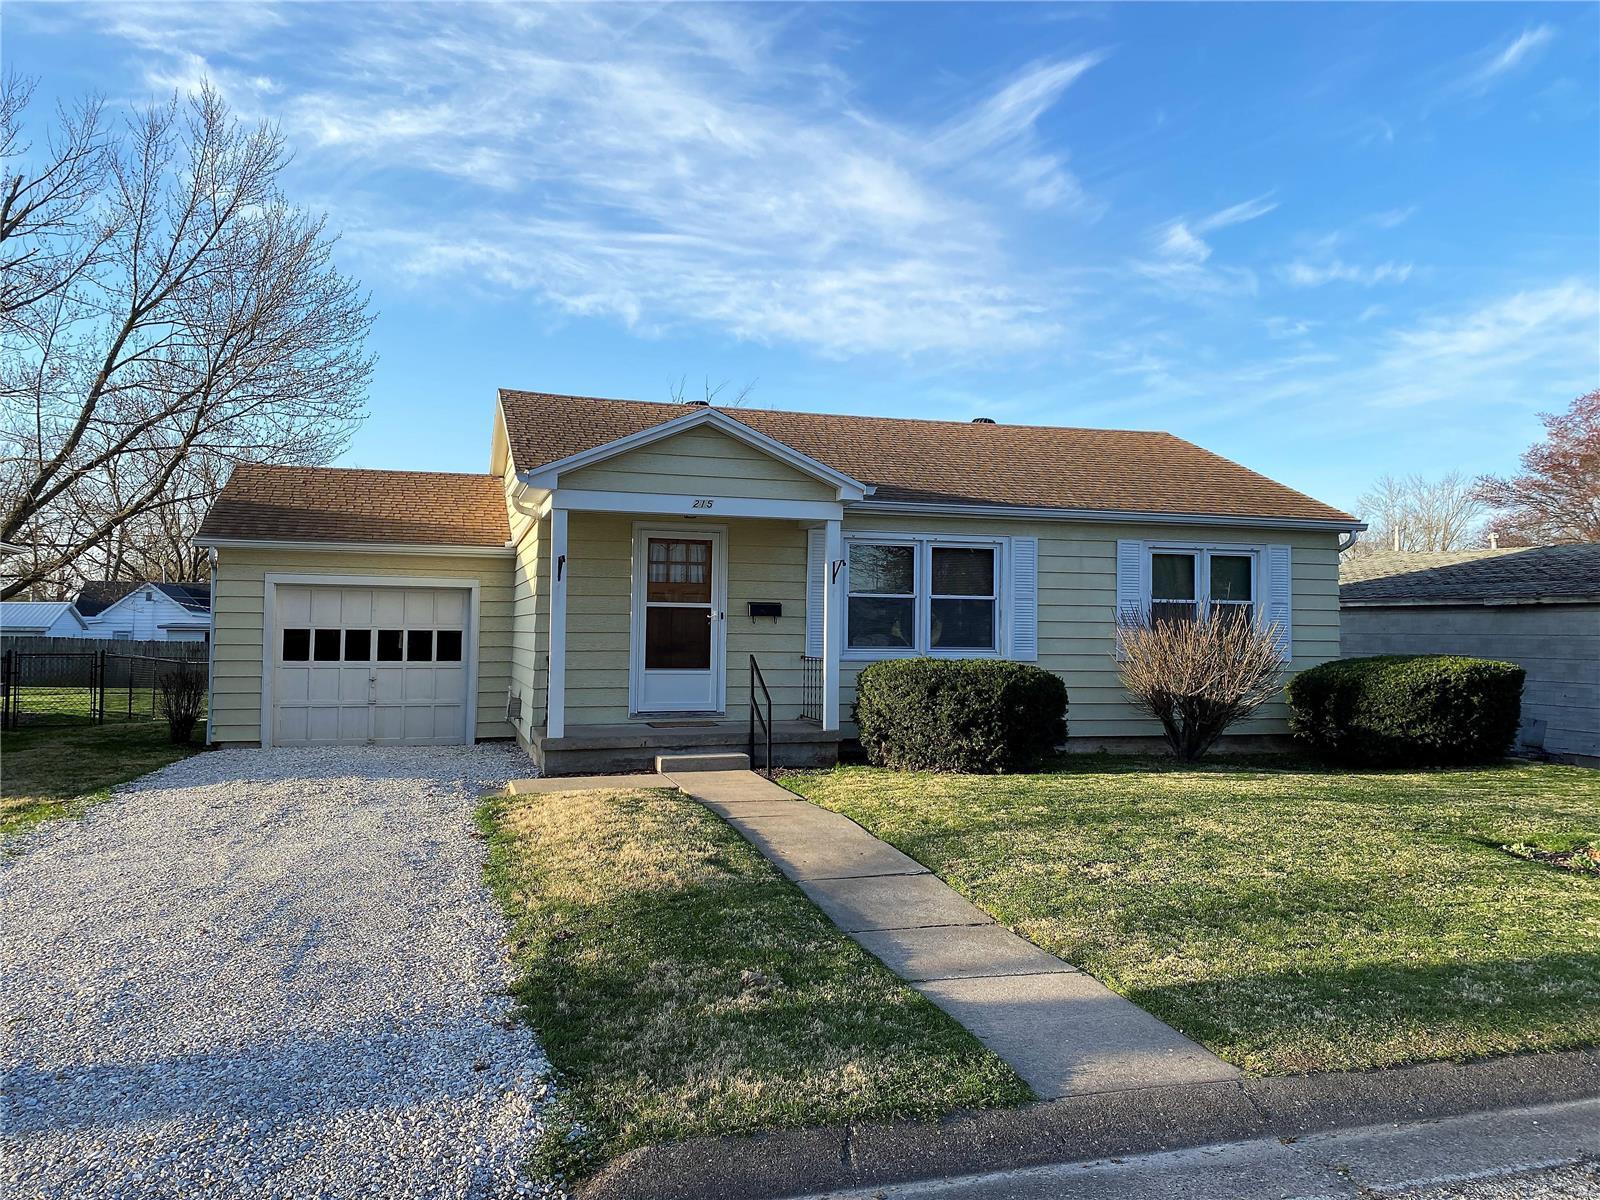 215 W Elm Property Photo - Palmyra, MO real estate listing